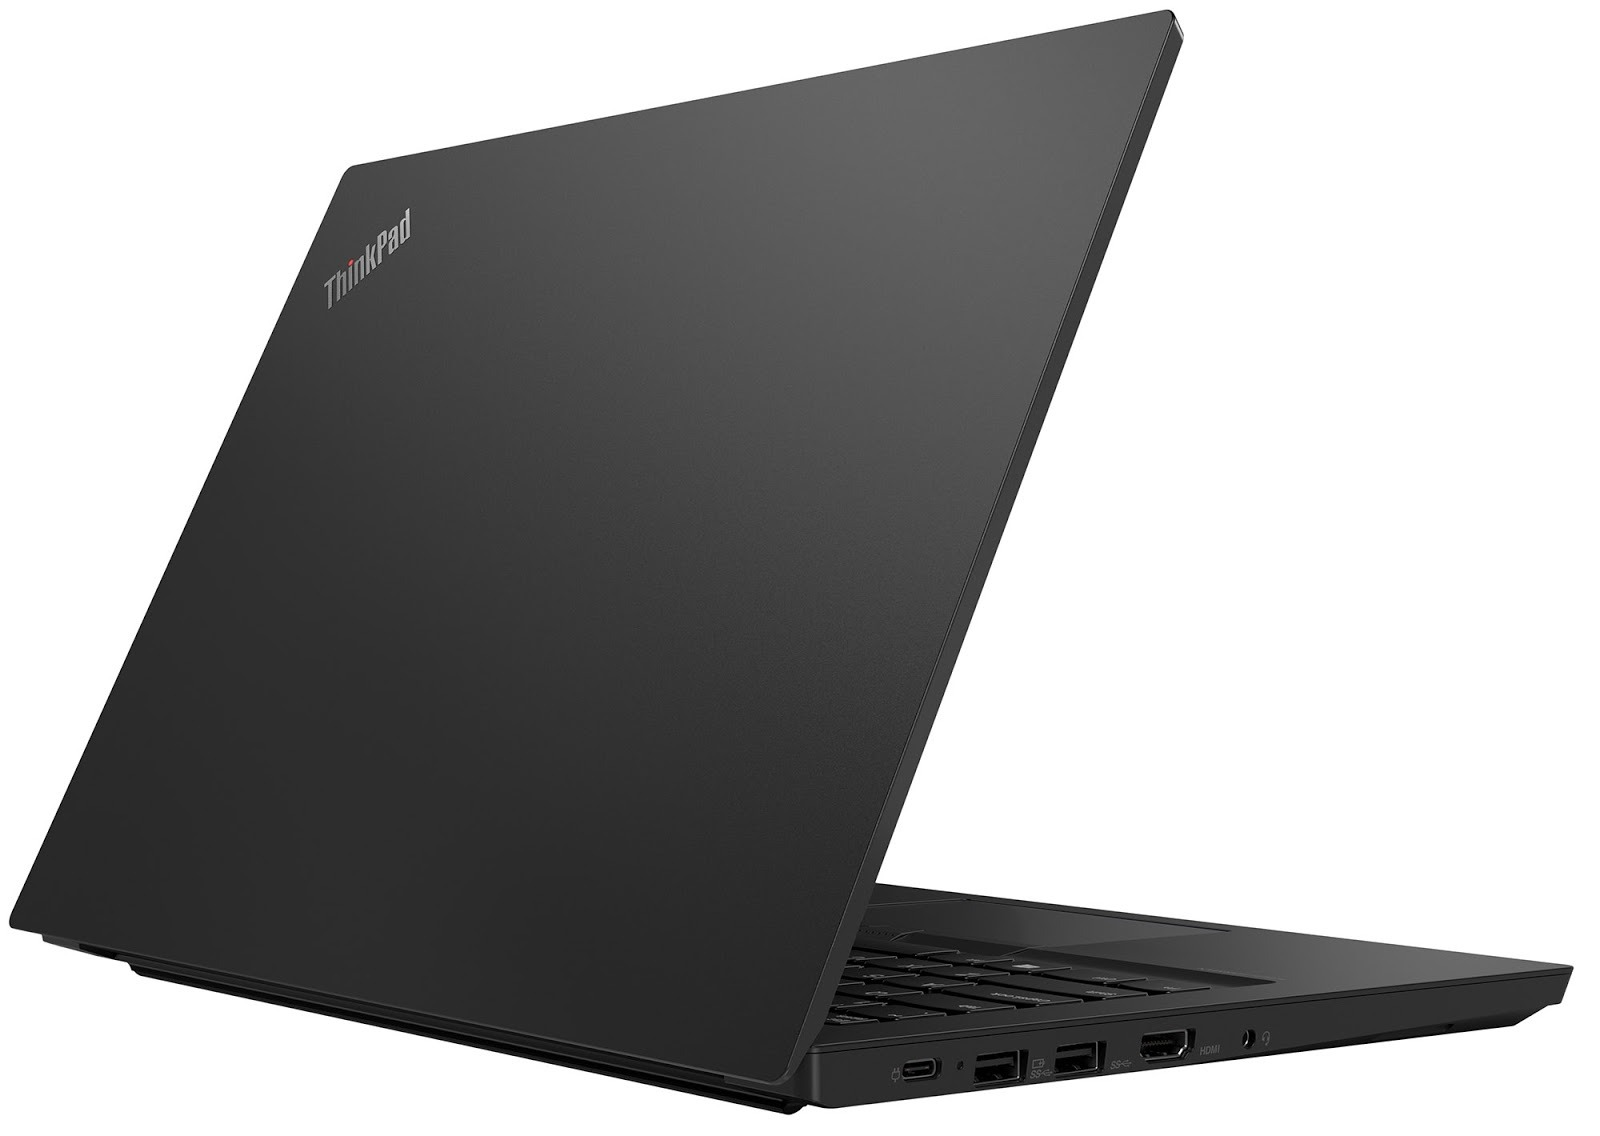 Фото 4. Ноутбук Lenovo ThinkPad E14 (20RA001LRT)